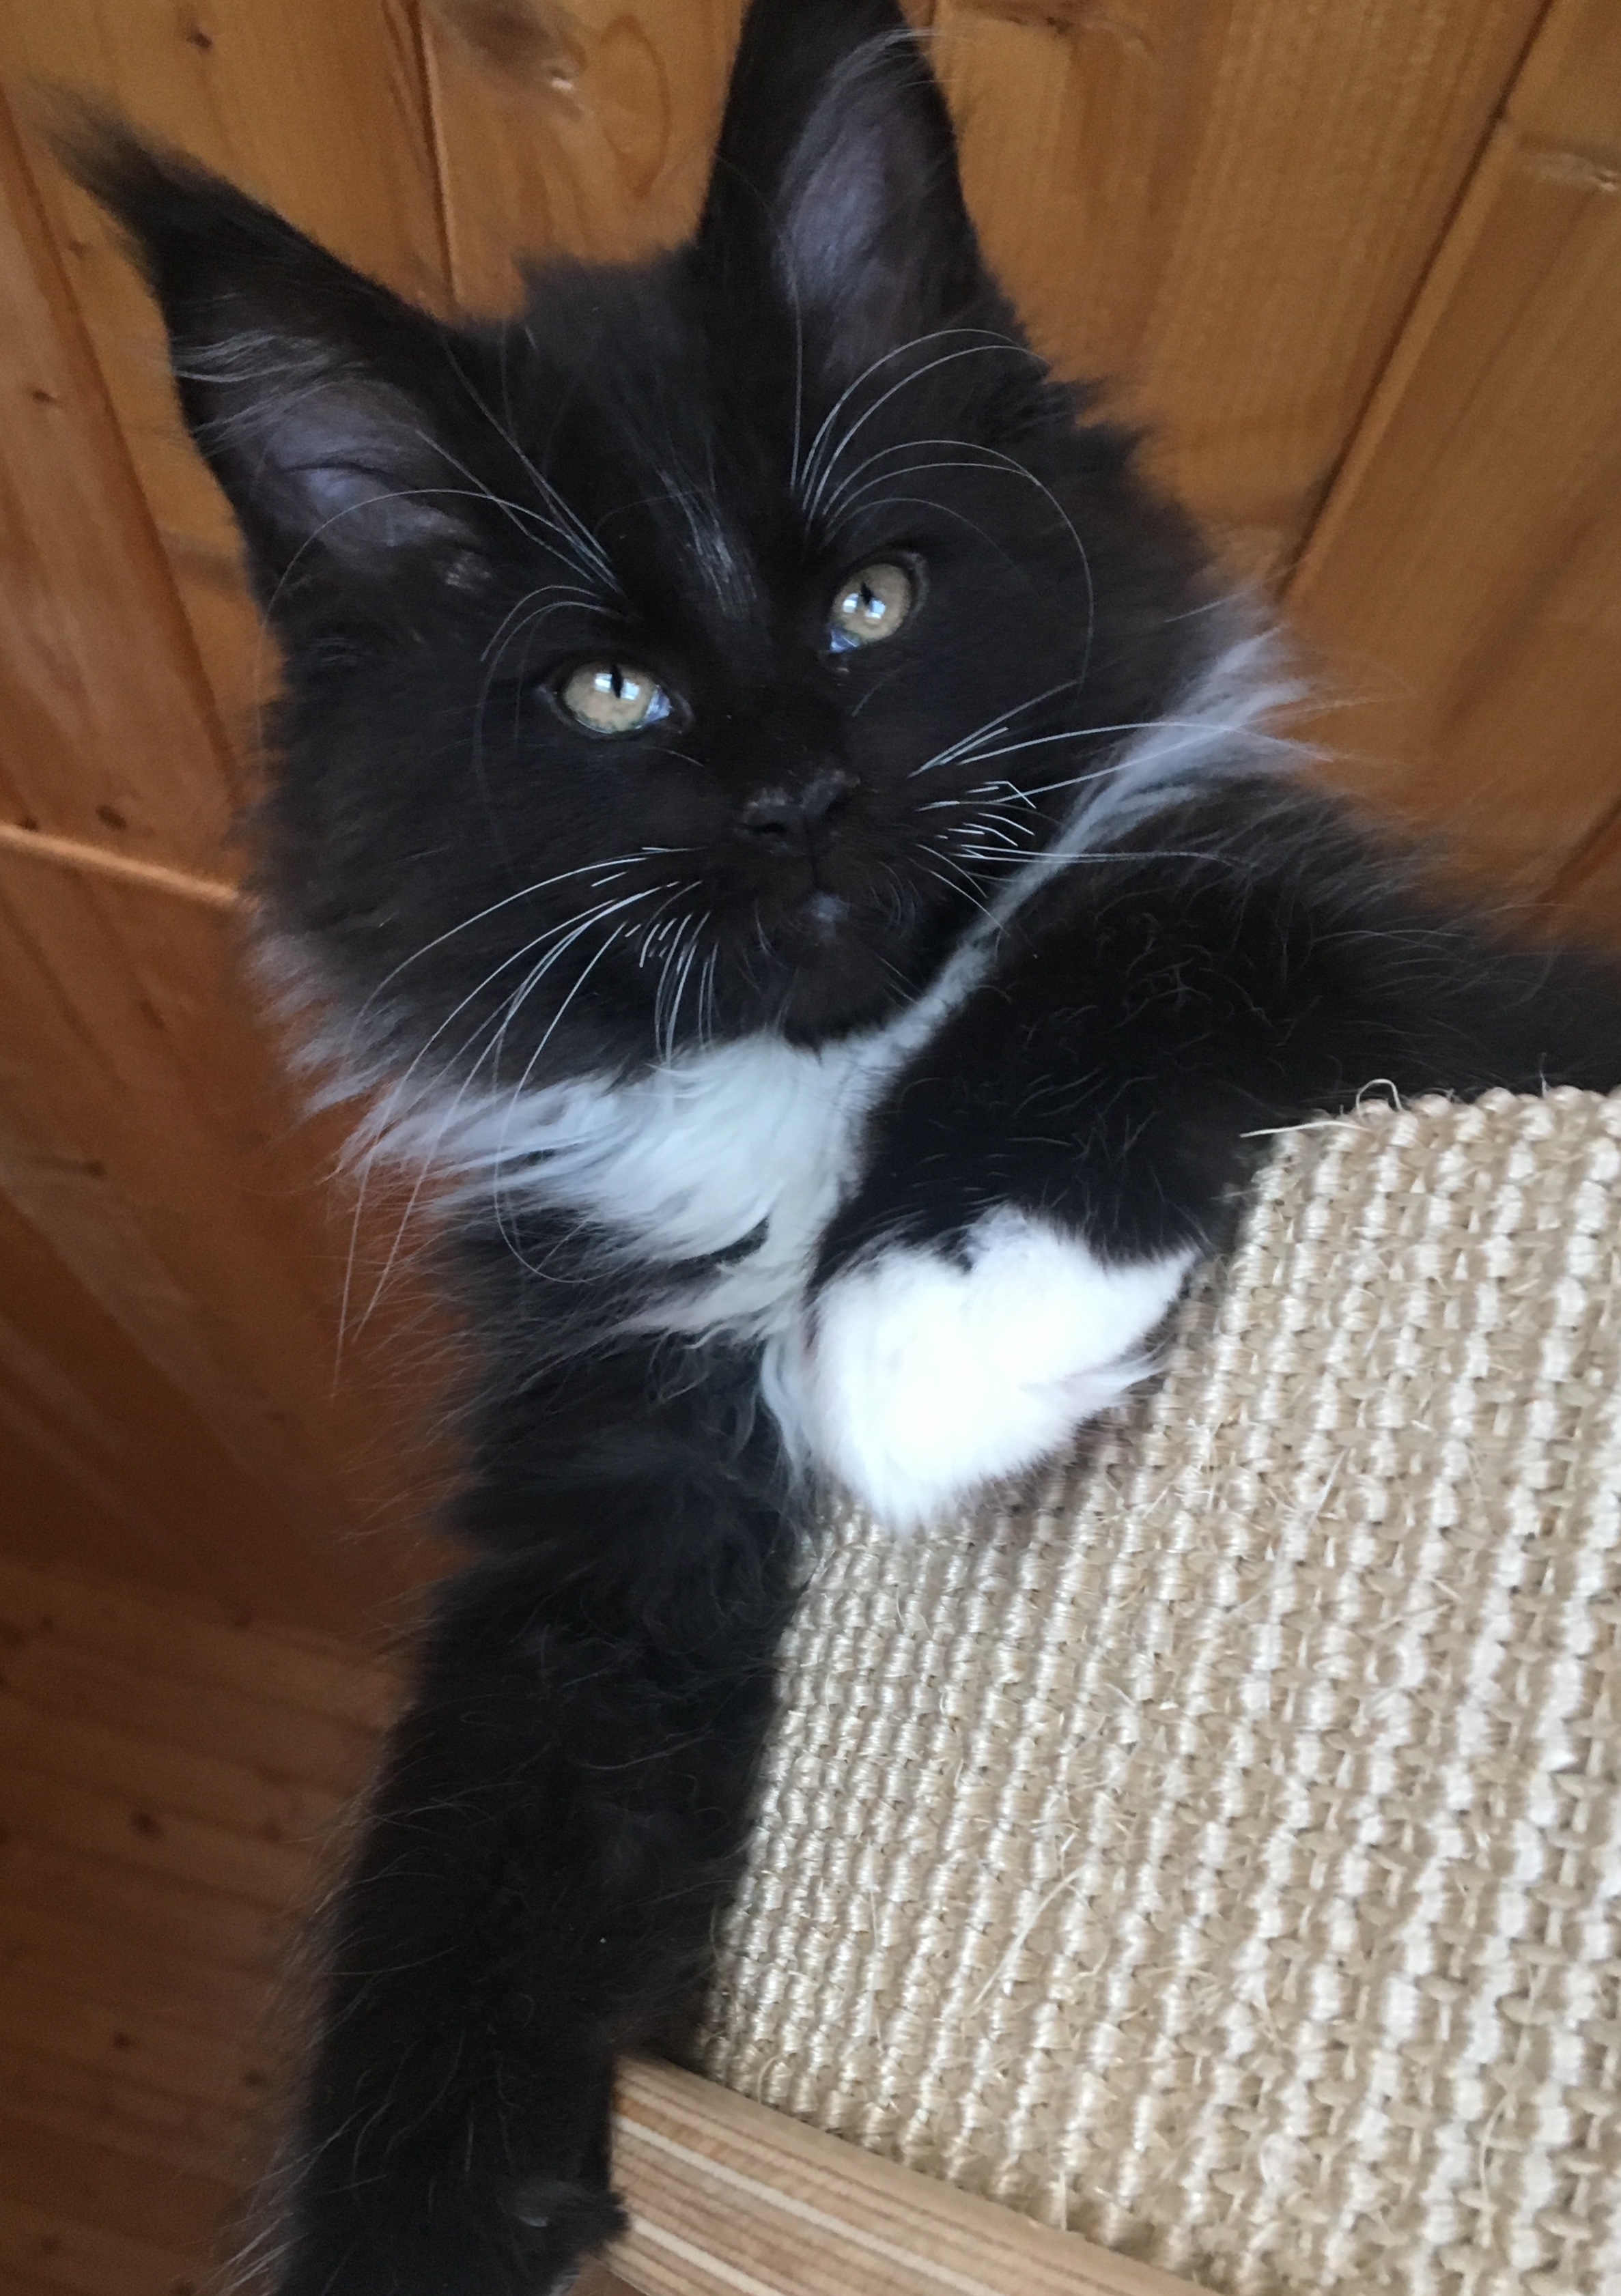 fotka kočky VRH E: EDDIE von ERILLIAN*CZ 👦🏻